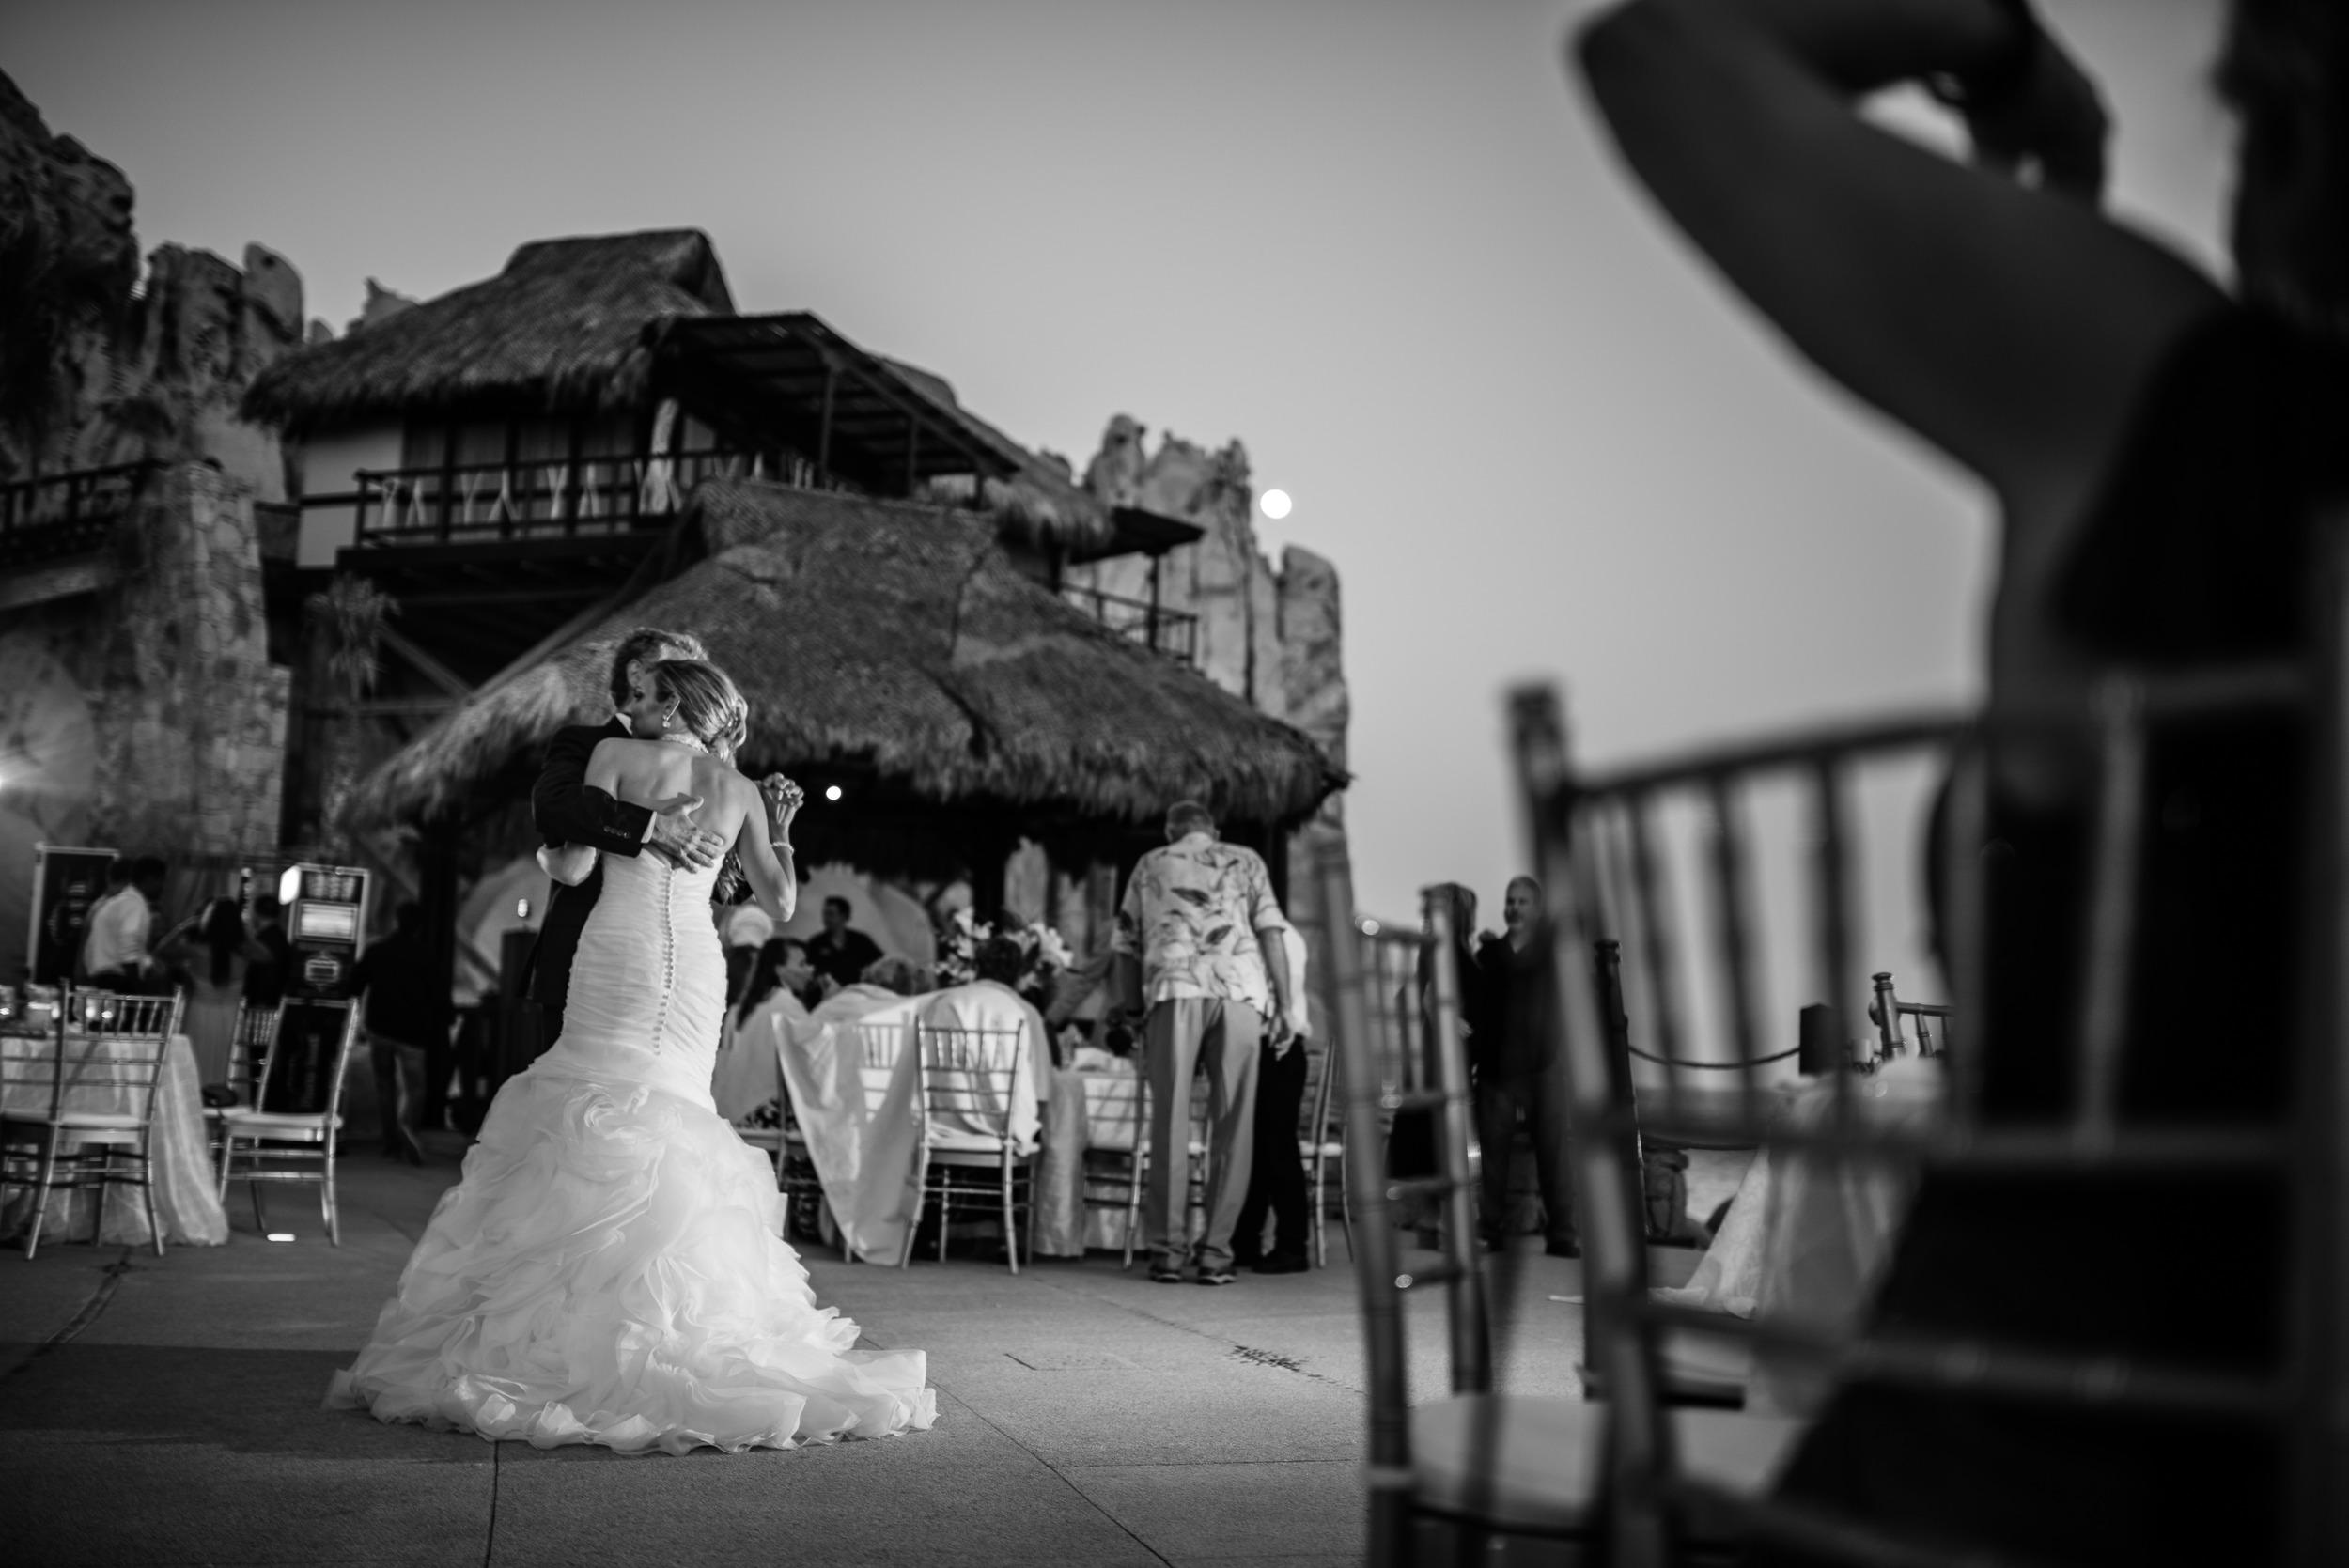 Our wedding day-1027.JPG